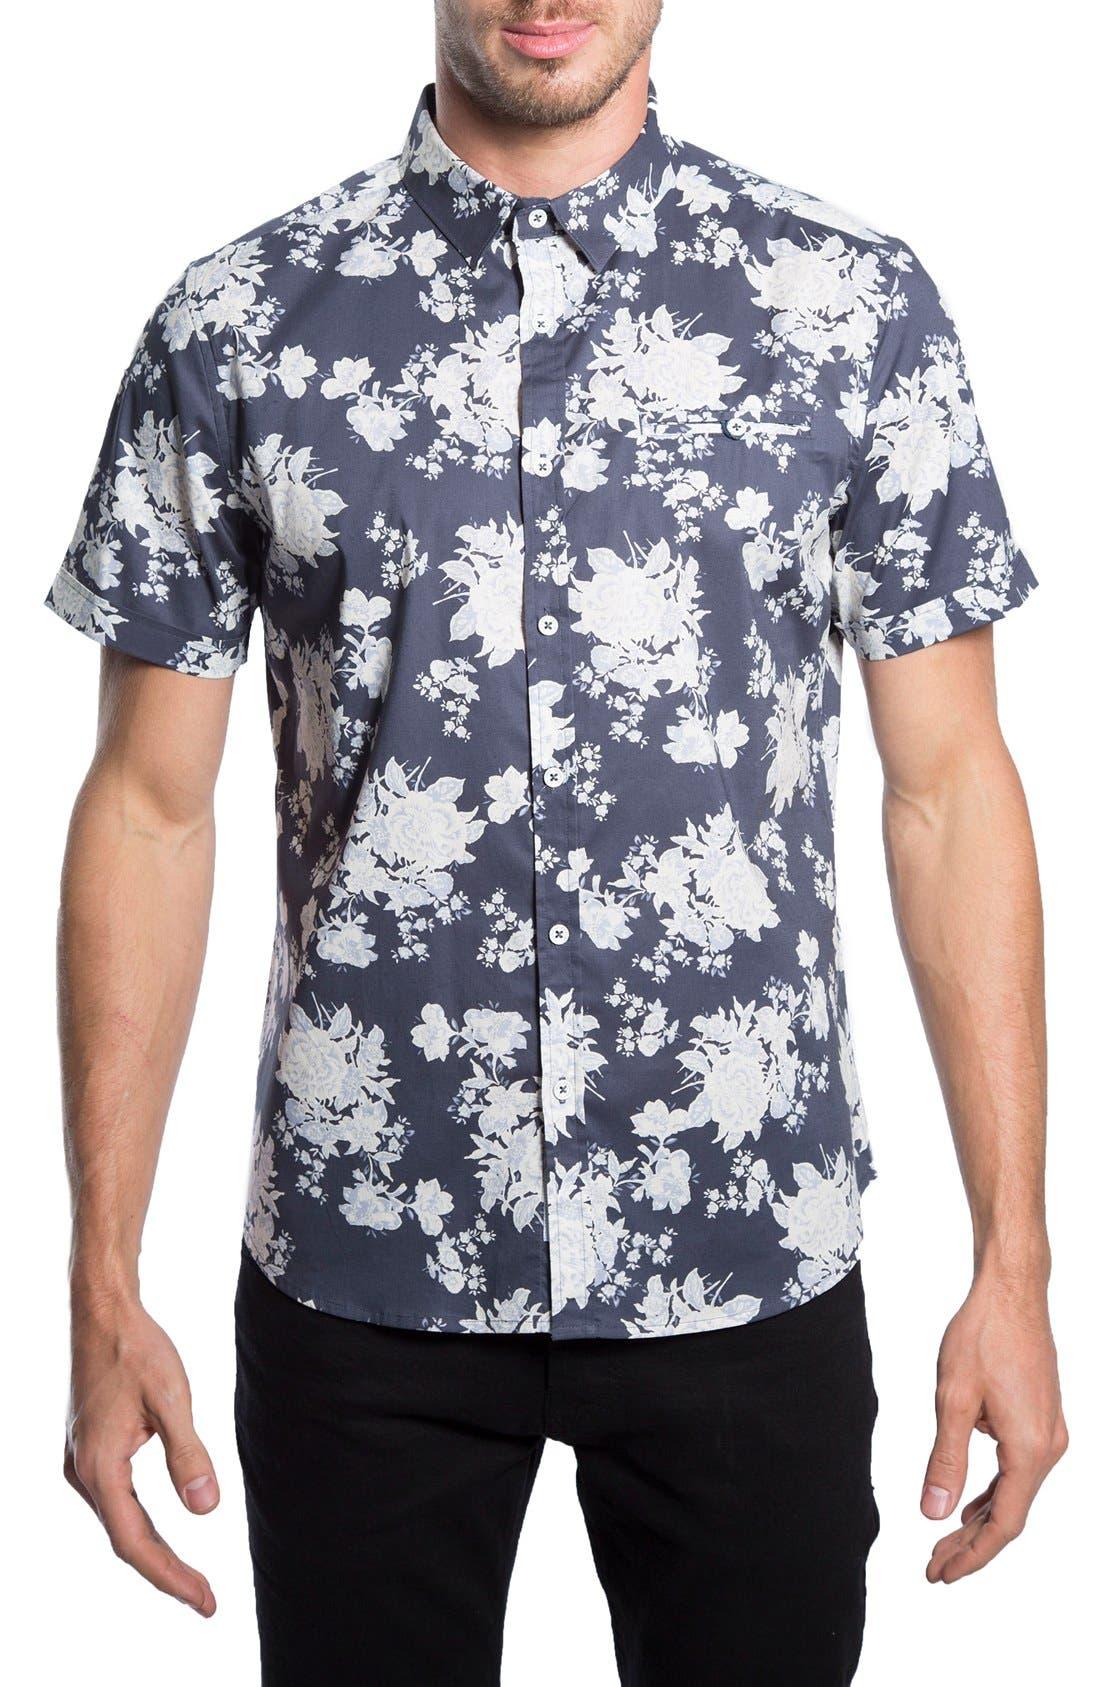 'Better Place' Trim Fit Floral Short Sleeve Woven Shirt,                         Main,                         color, Navy